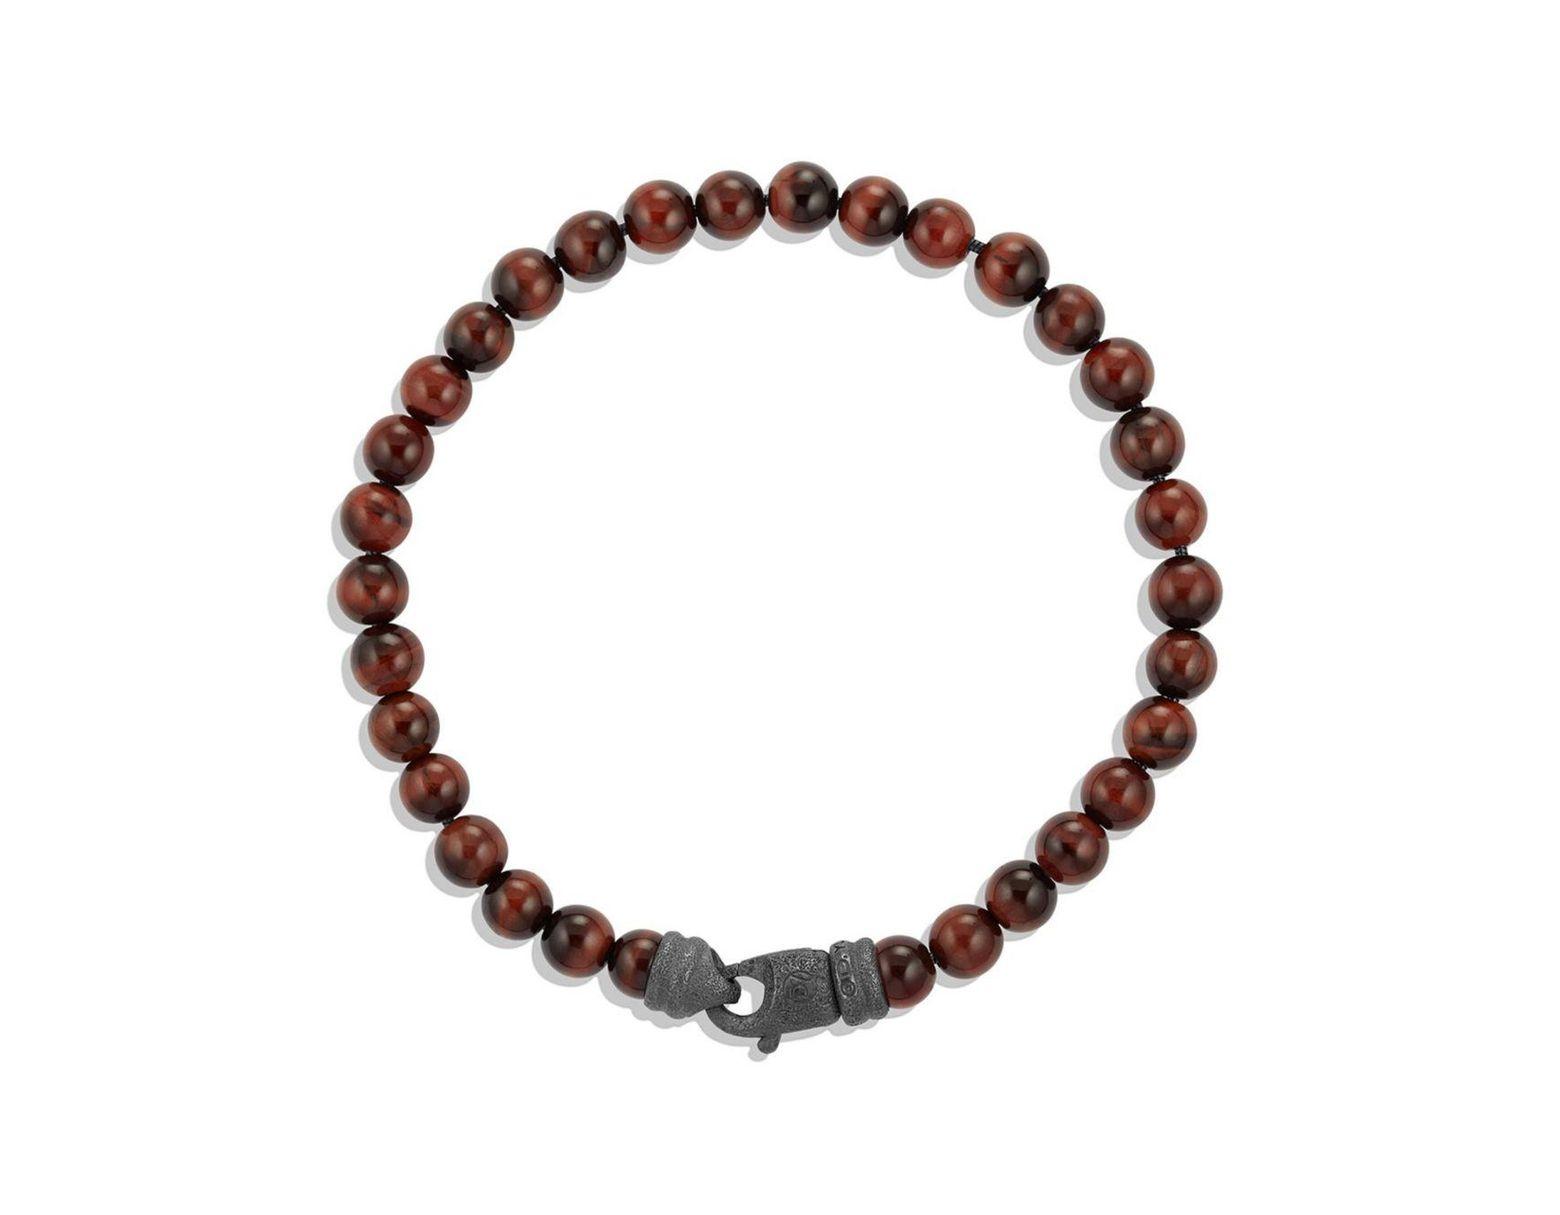 ca18744c7e832 Men's Brown Spiritual Bead Tiger'S Eye Bracelet